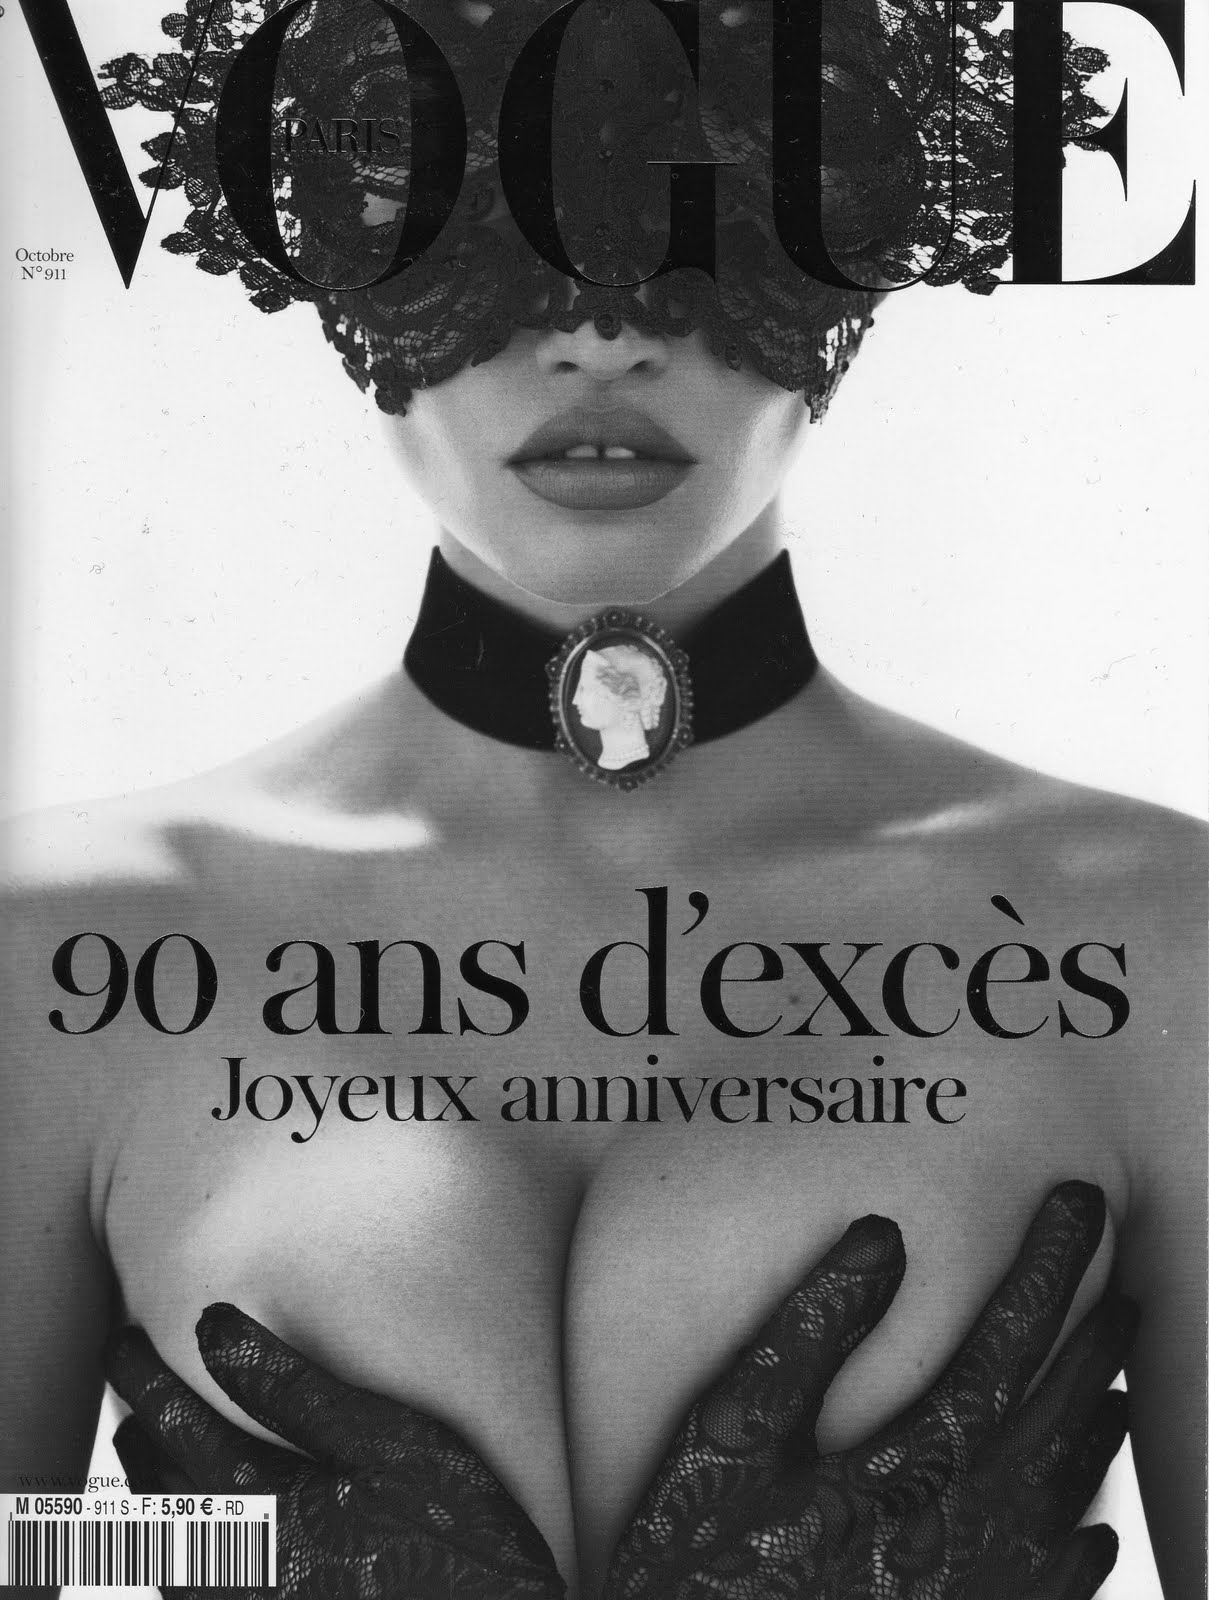 http://2.bp.blogspot.com/_2QGiLPrLco0/TKfwKoNycoI/AAAAAAAACcg/4eHe1koFWdk/s1600/Lara+Stone,+Freja+Beha+Erichsen+&+Mariacarla+Boscono+for+Vogue+Paris+October+2010+by+Mert+&+Marcus+1.jpg